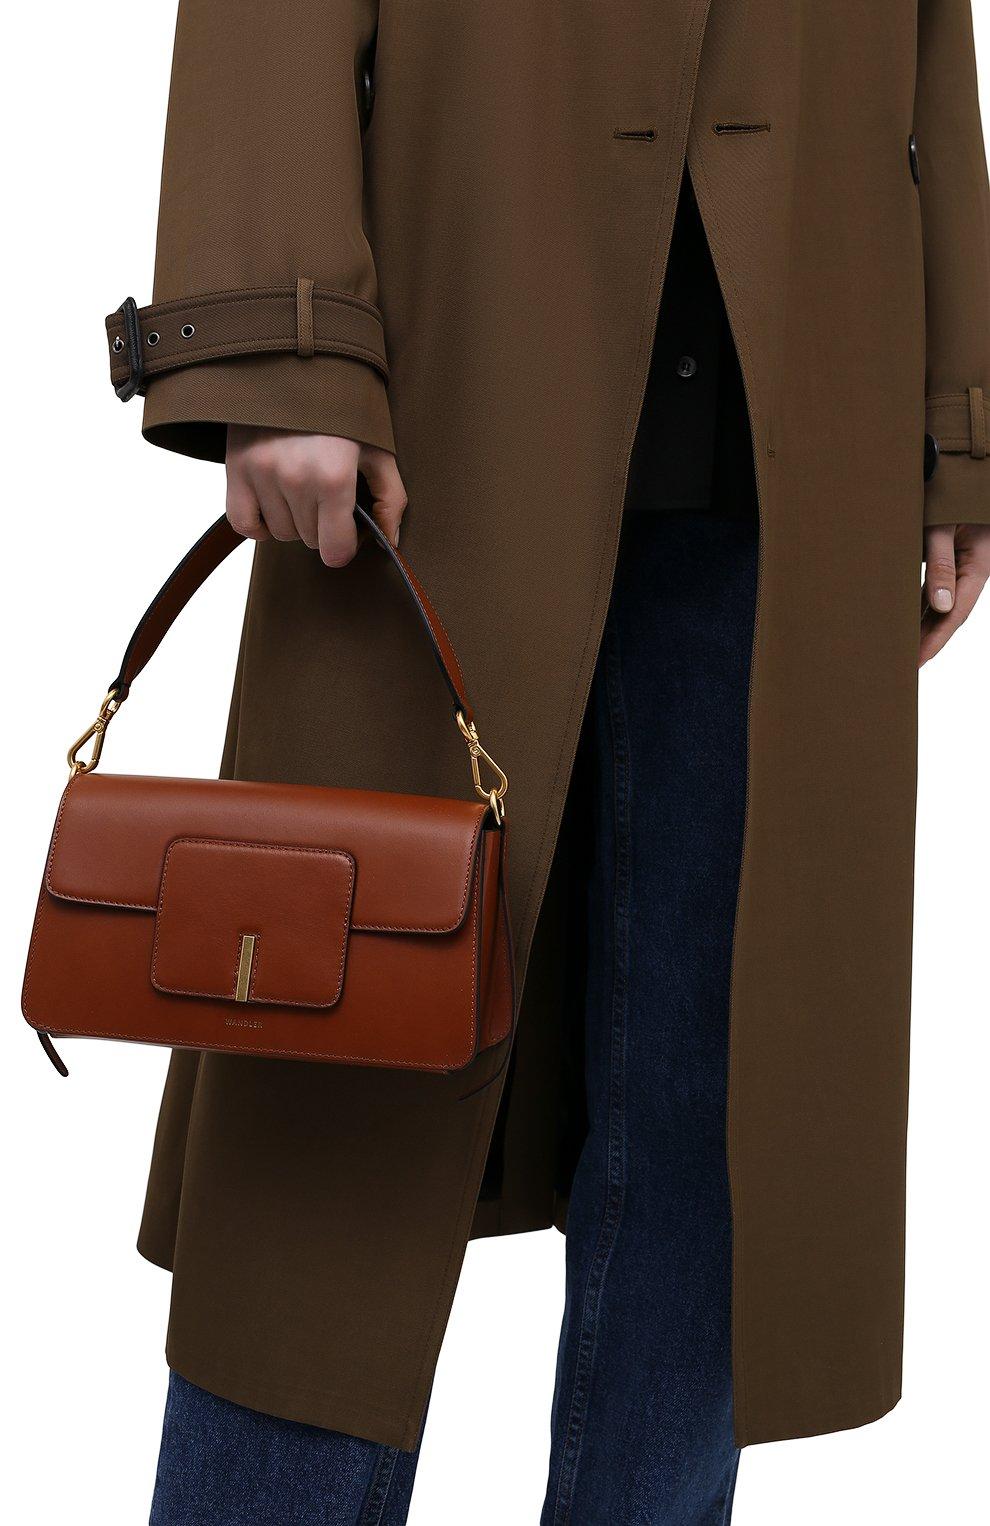 Женская сумка georgia WANDLER коричневого цвета, арт. GE0RGIA BAG   Фото 2 (Сумки-технические: Сумки через плечо, Сумки top-handle; Материал: Натуральная кожа; Размер: small)